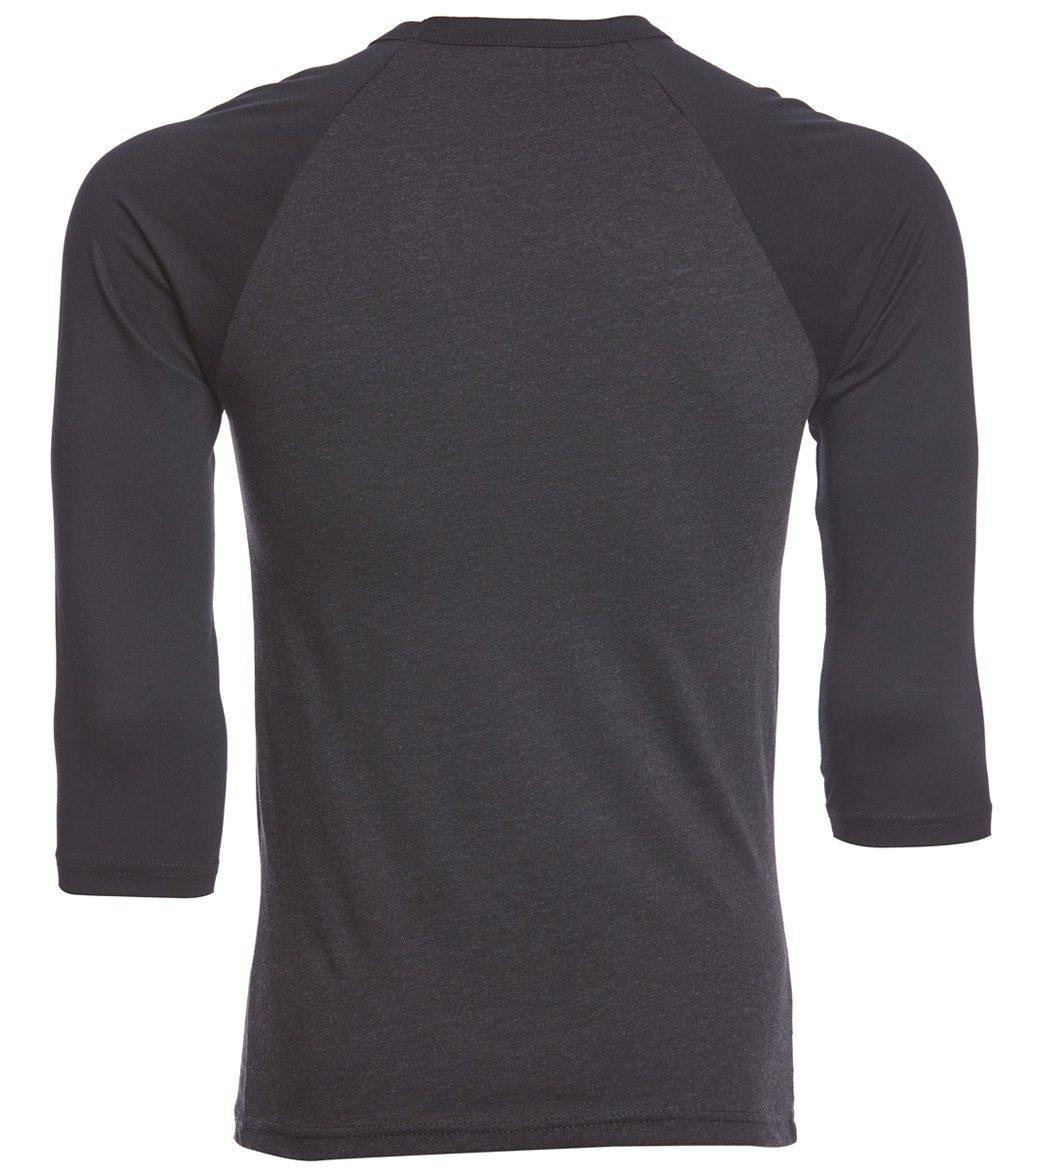 00fe0570656 Men s Shirts · Men s Long Sleeves. Visit Product Page close X. Loading  photo.